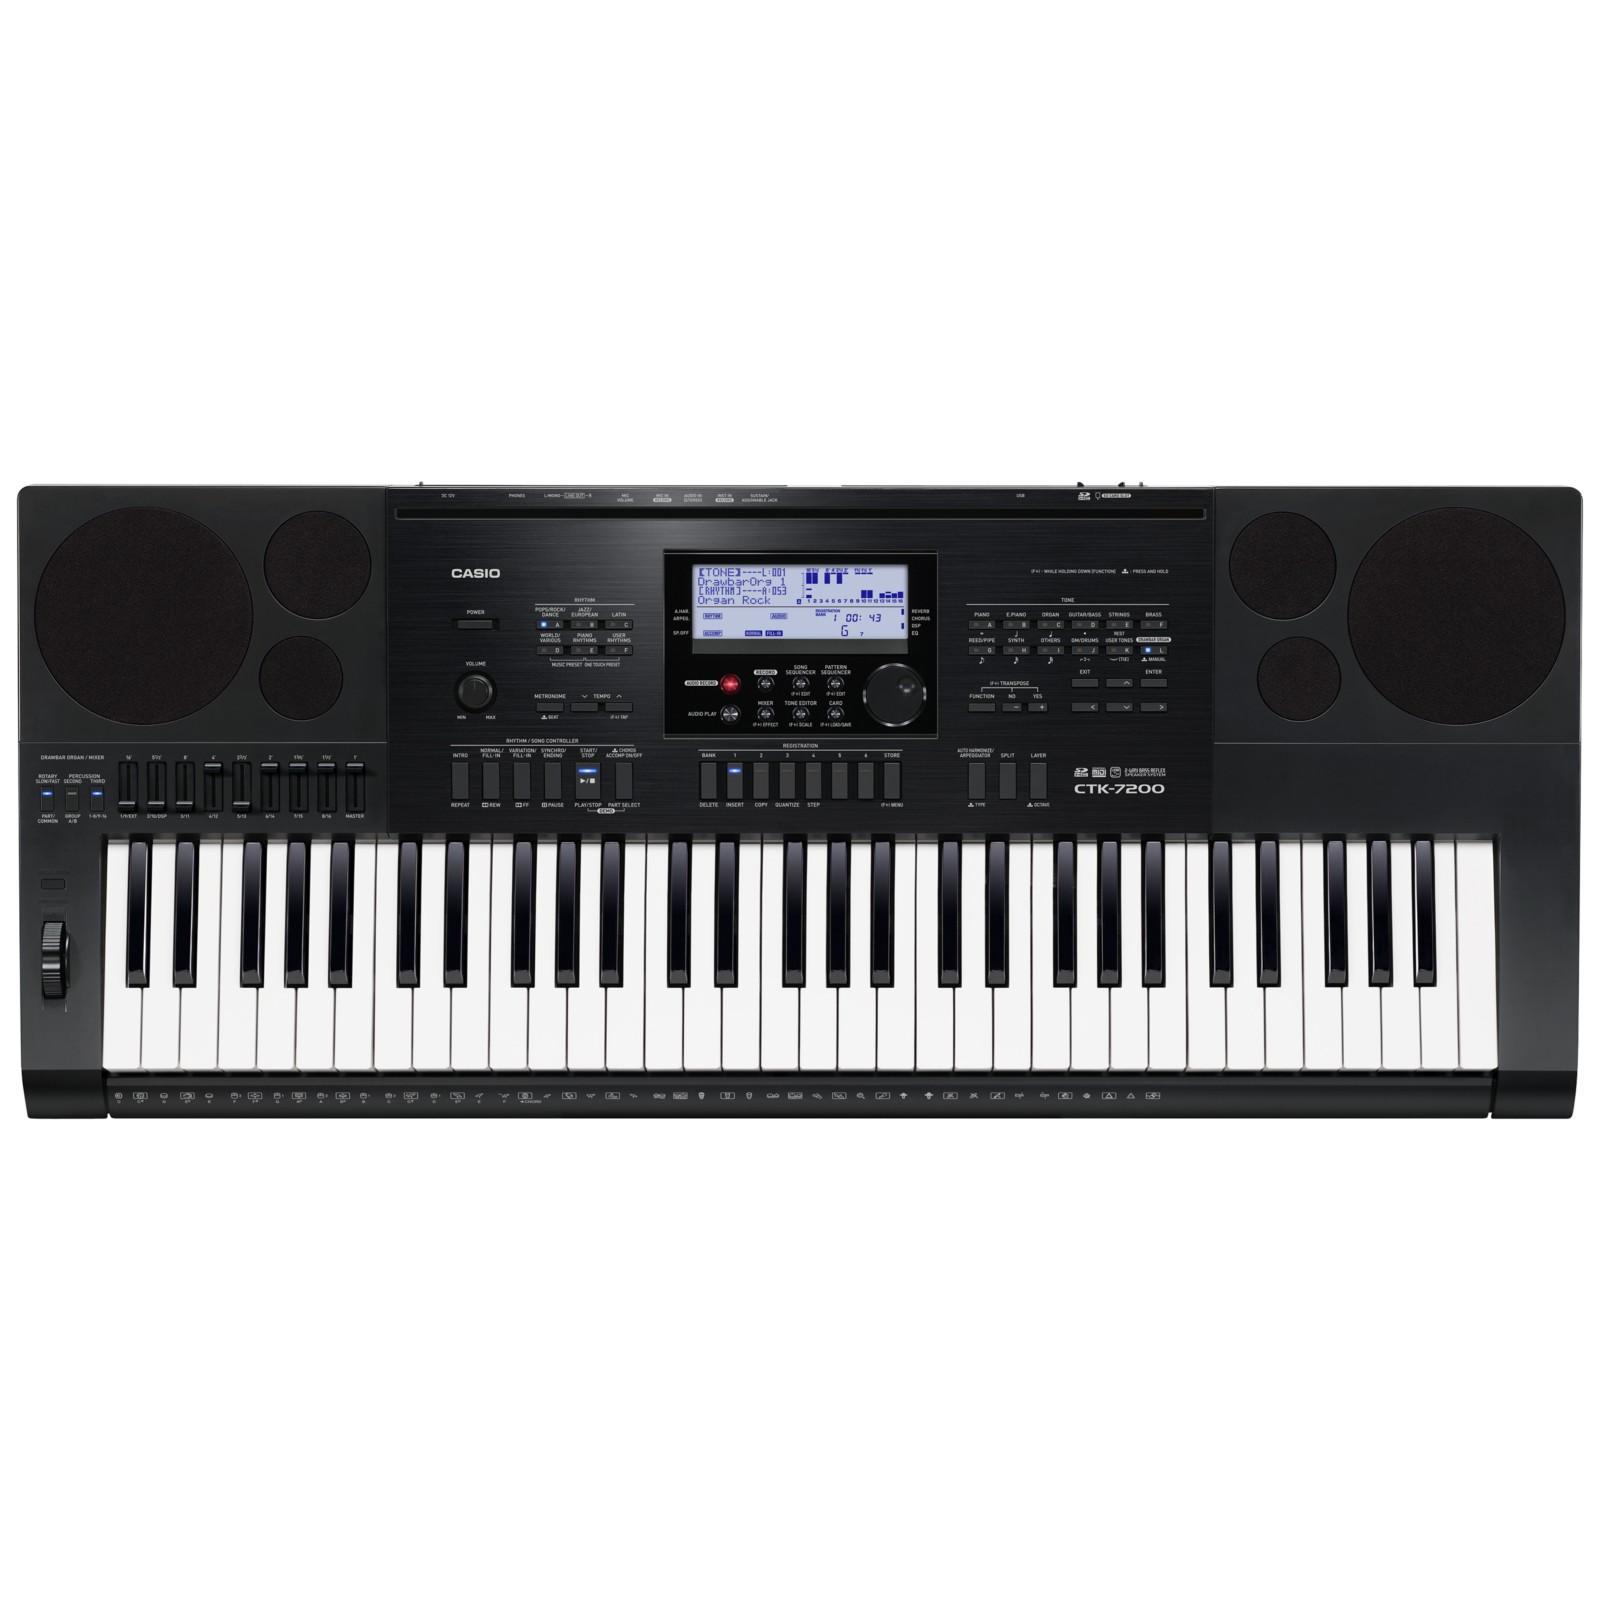 casio ctk 7200 61 key keyboard review best buy review